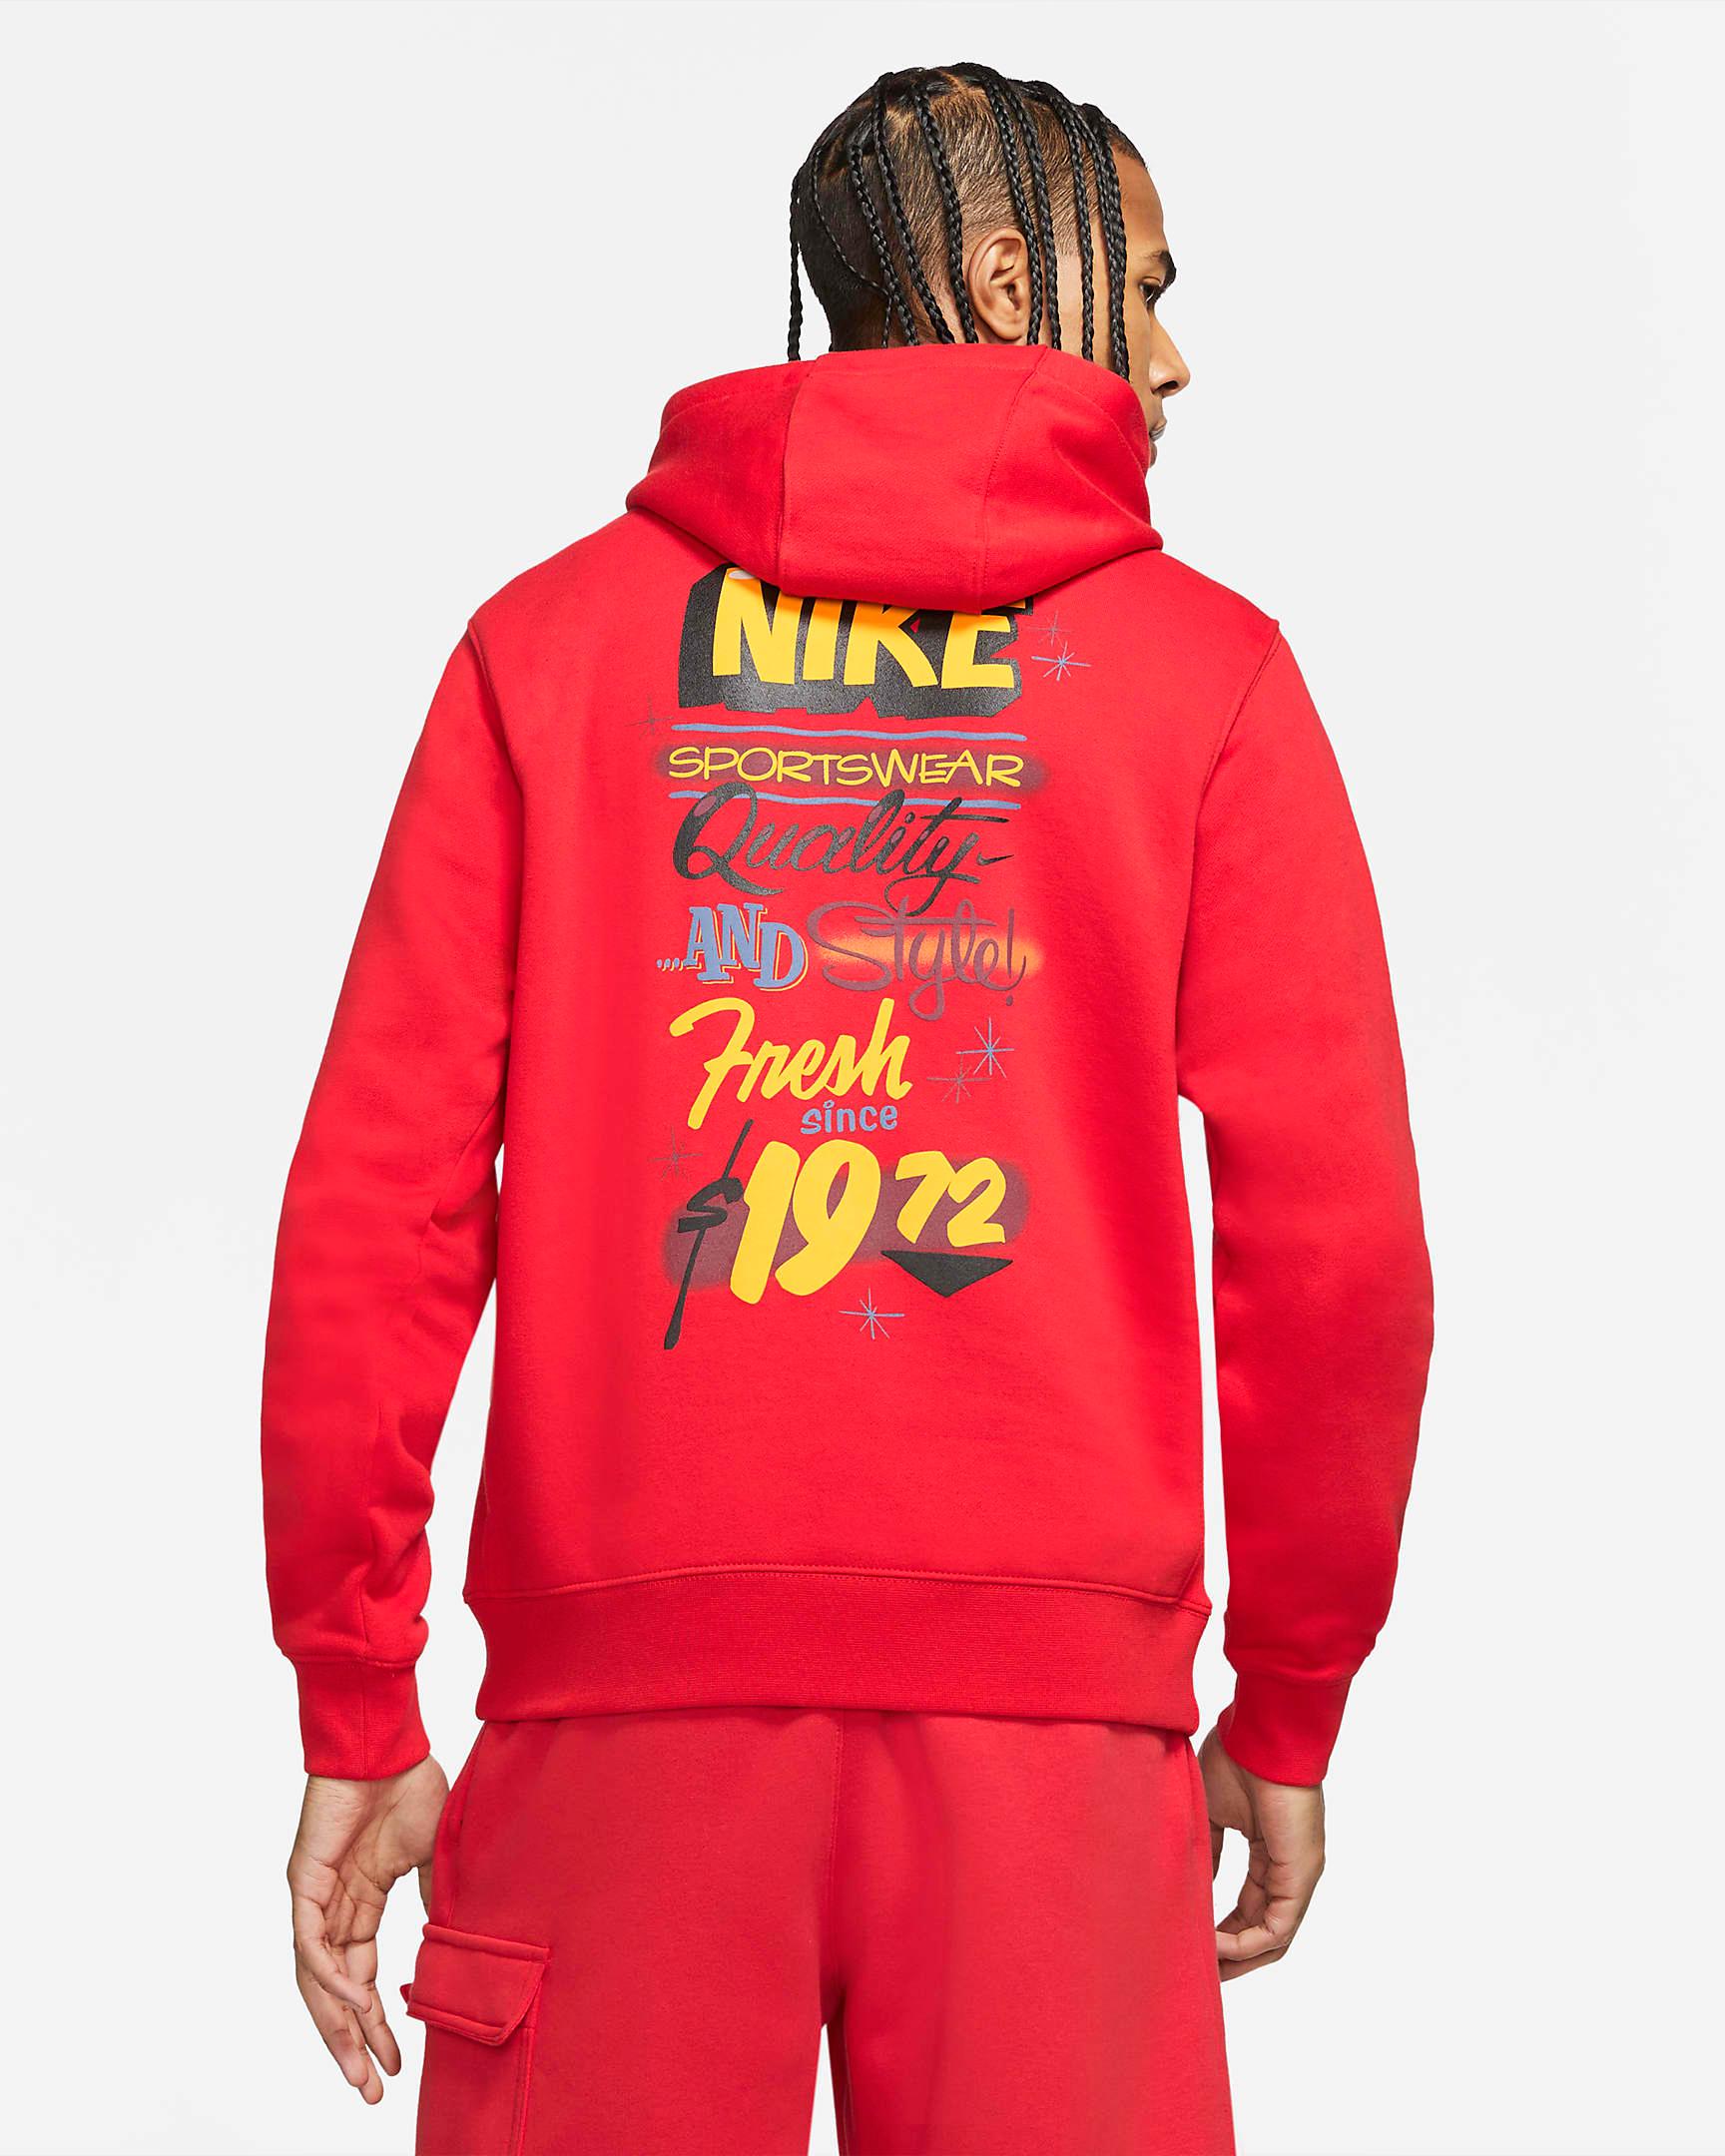 nike-bodega-red-hoodie-2